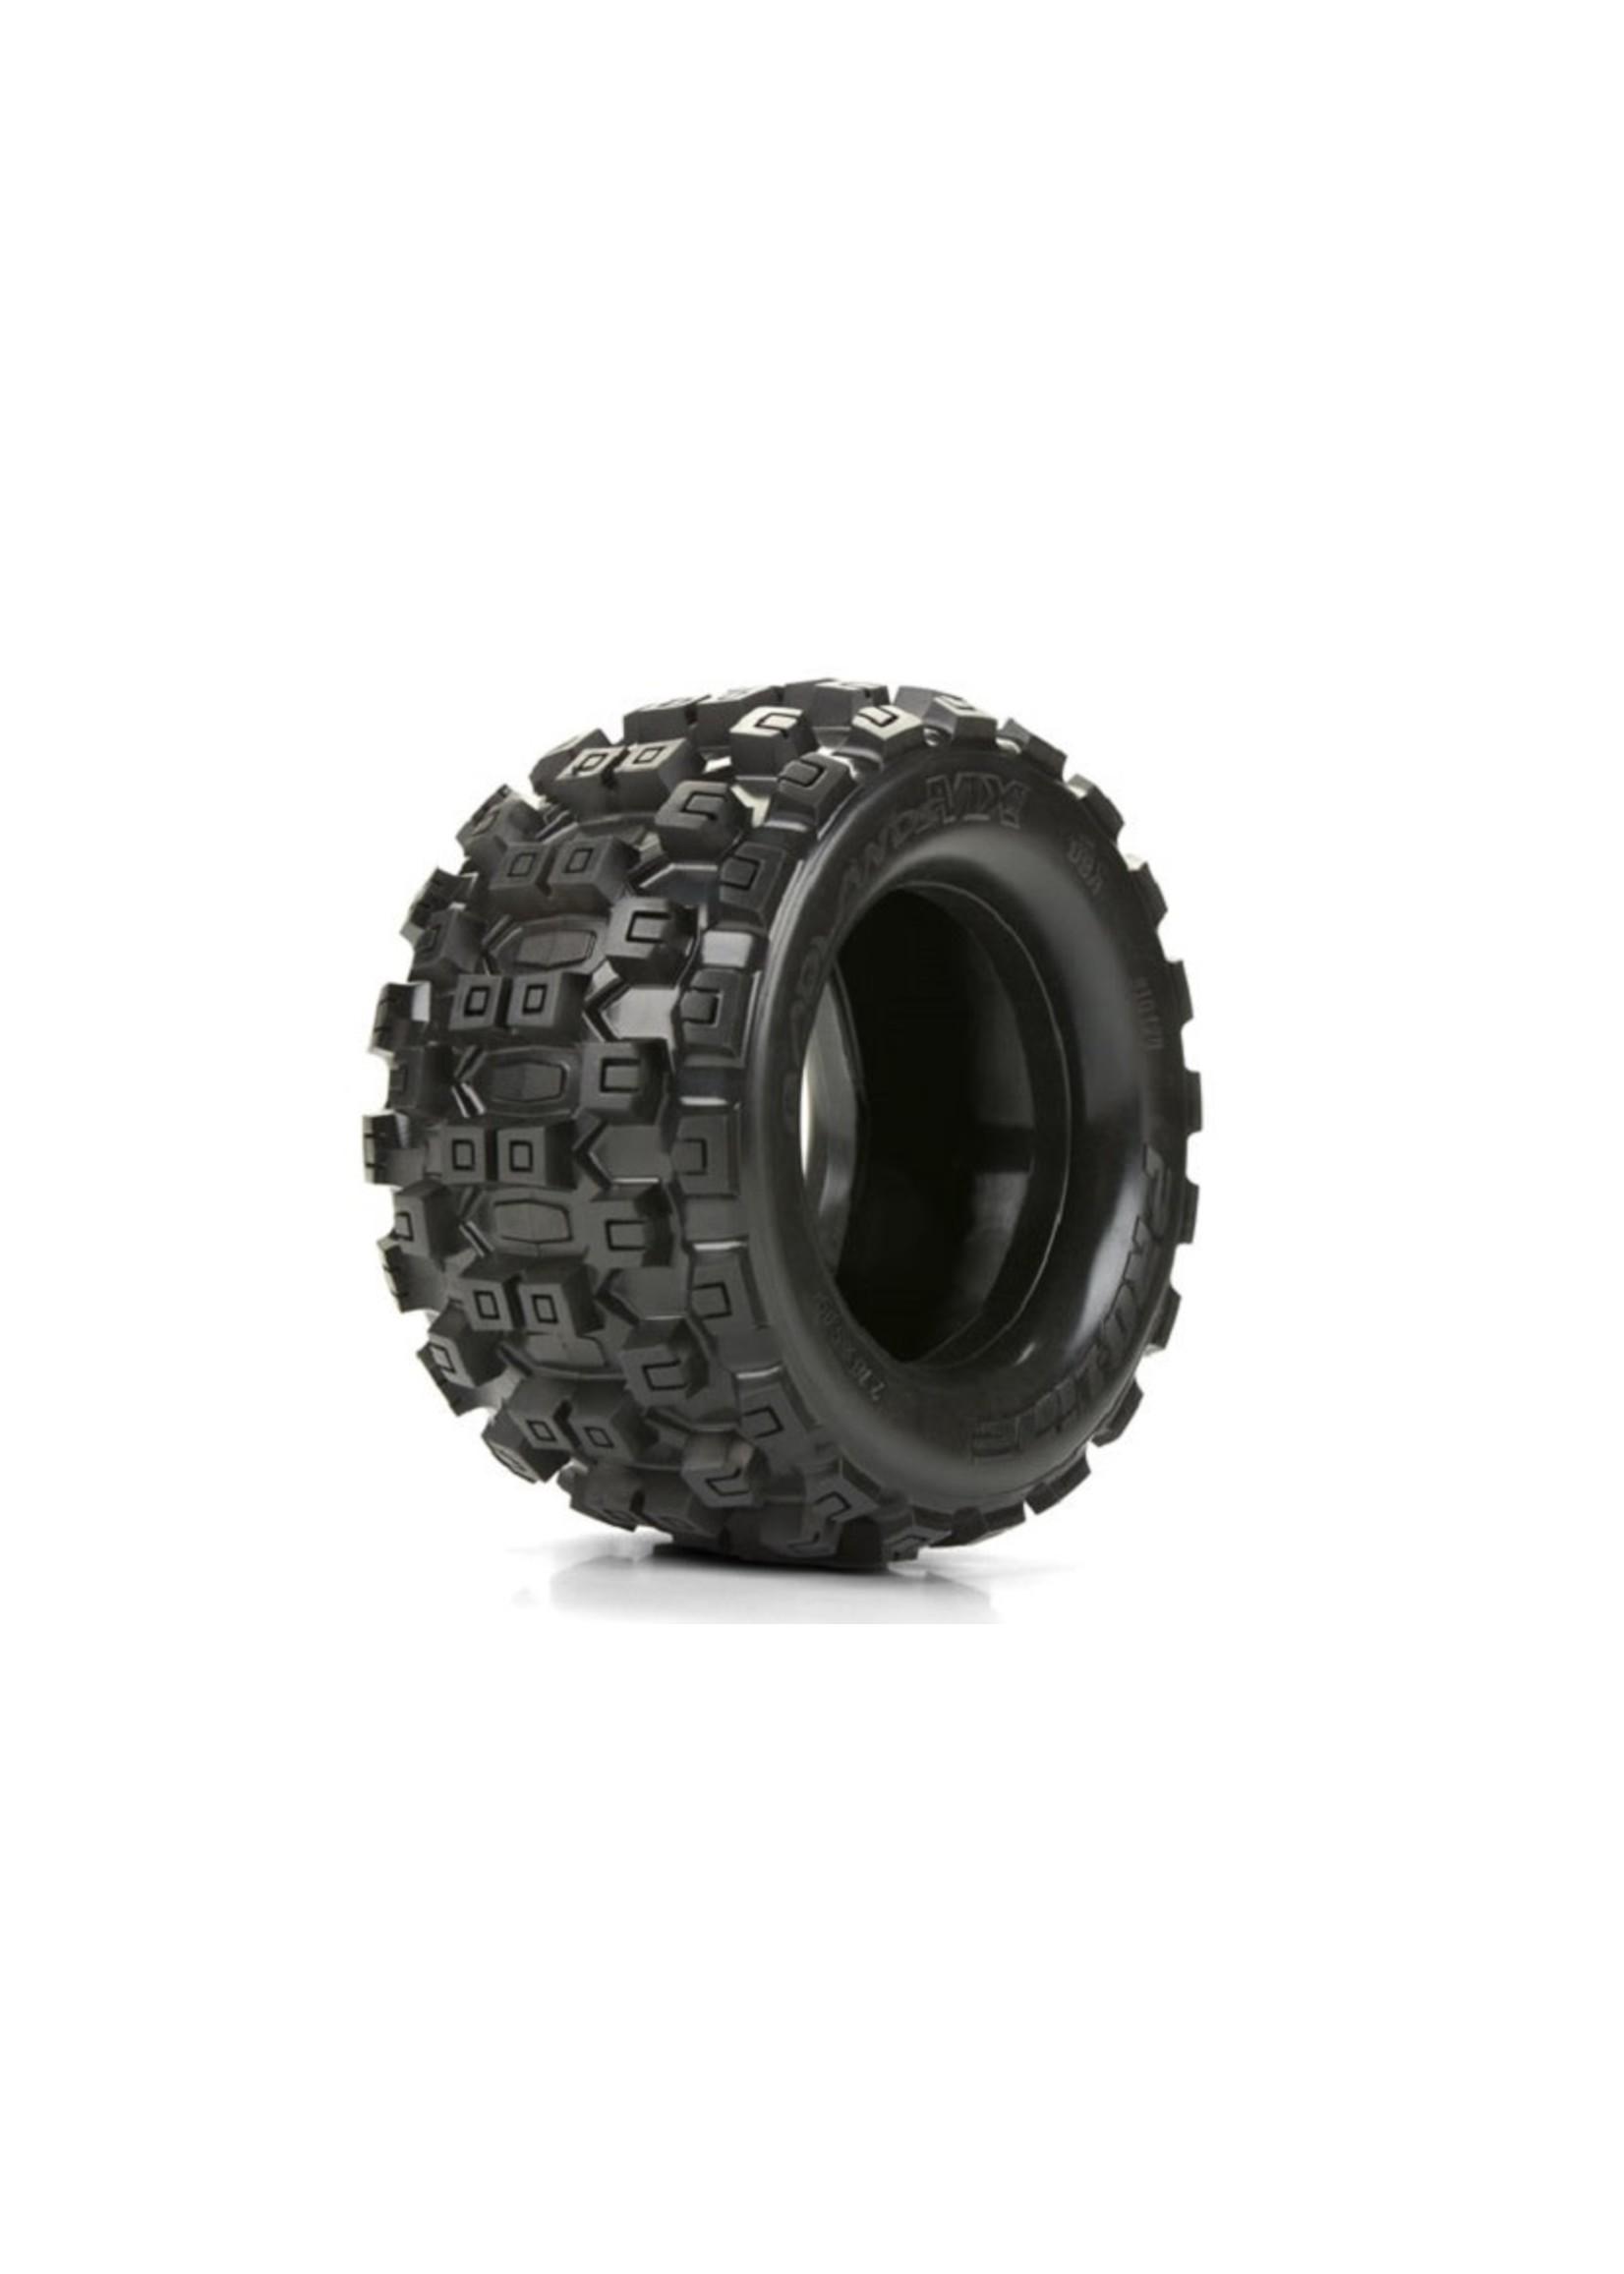 Pro-Line Racing PRO10125-00 Pro-Line Badlands MX28 30 Series 2.8'' Tire (2) (M2)